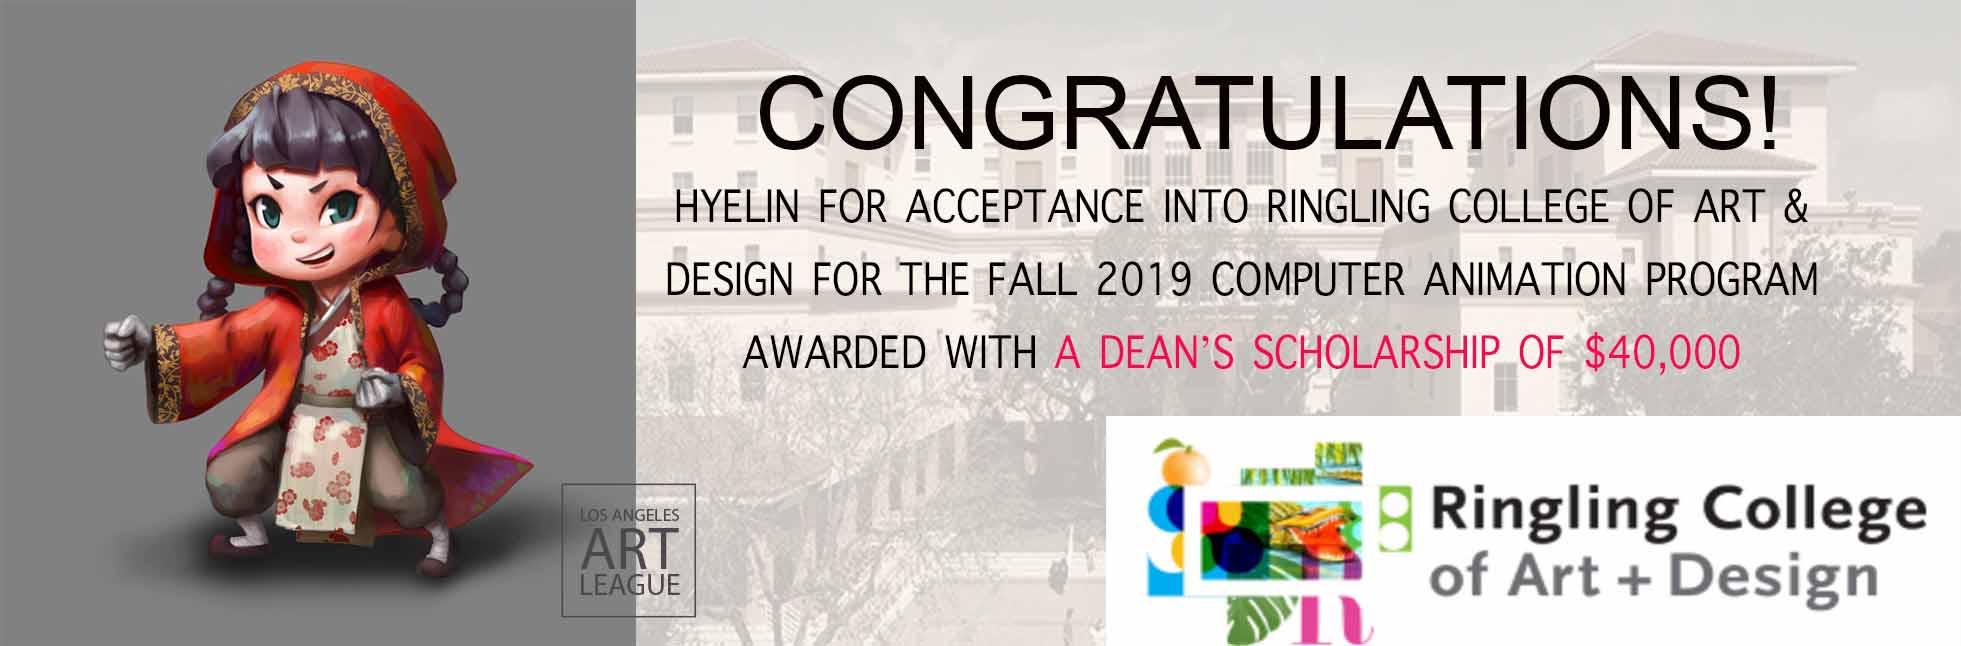 acceptance_Hyelin.jpg